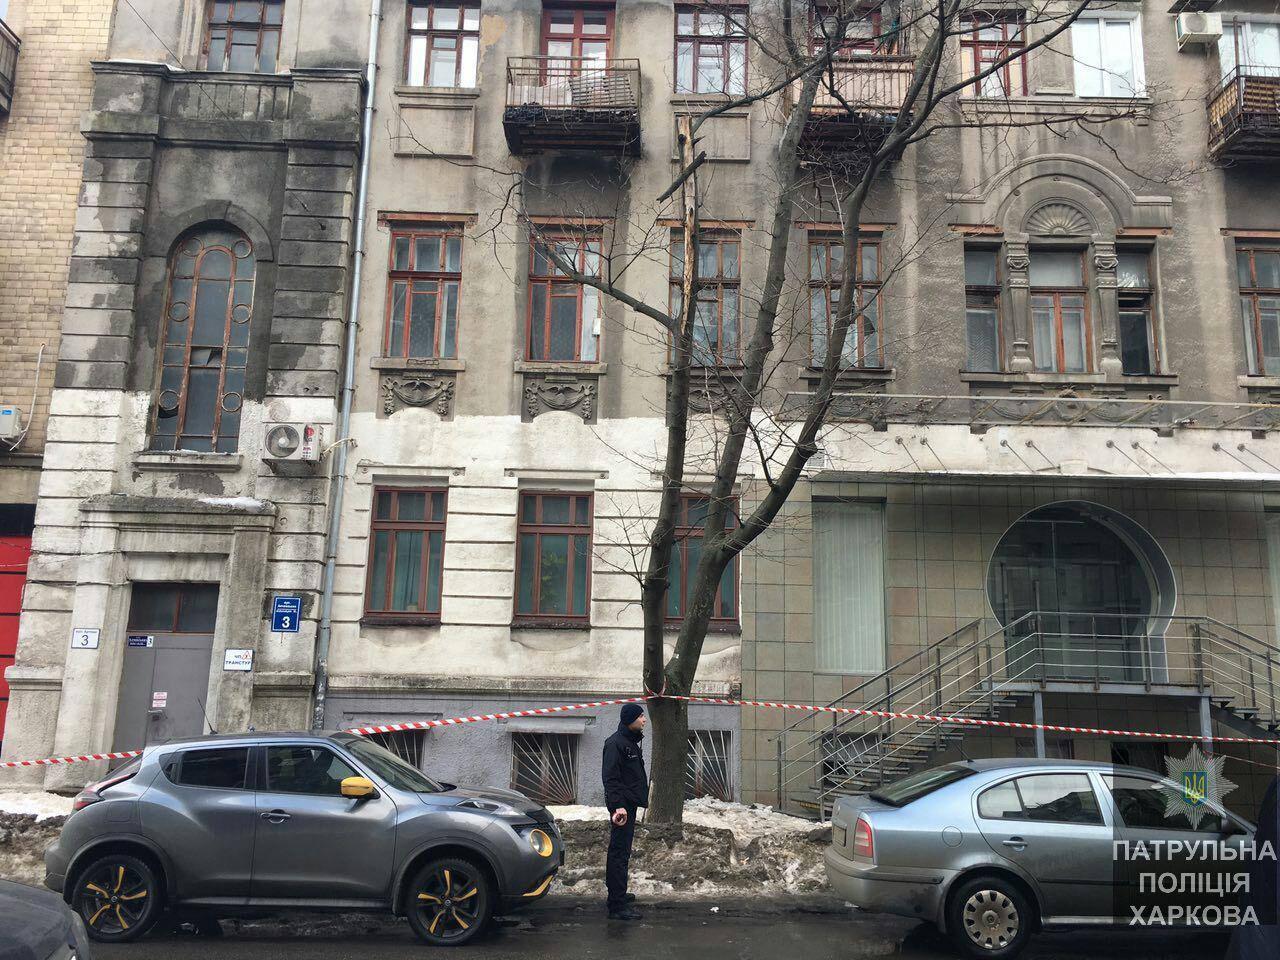 Вцентре Харькова надевушку упала снежная глыба